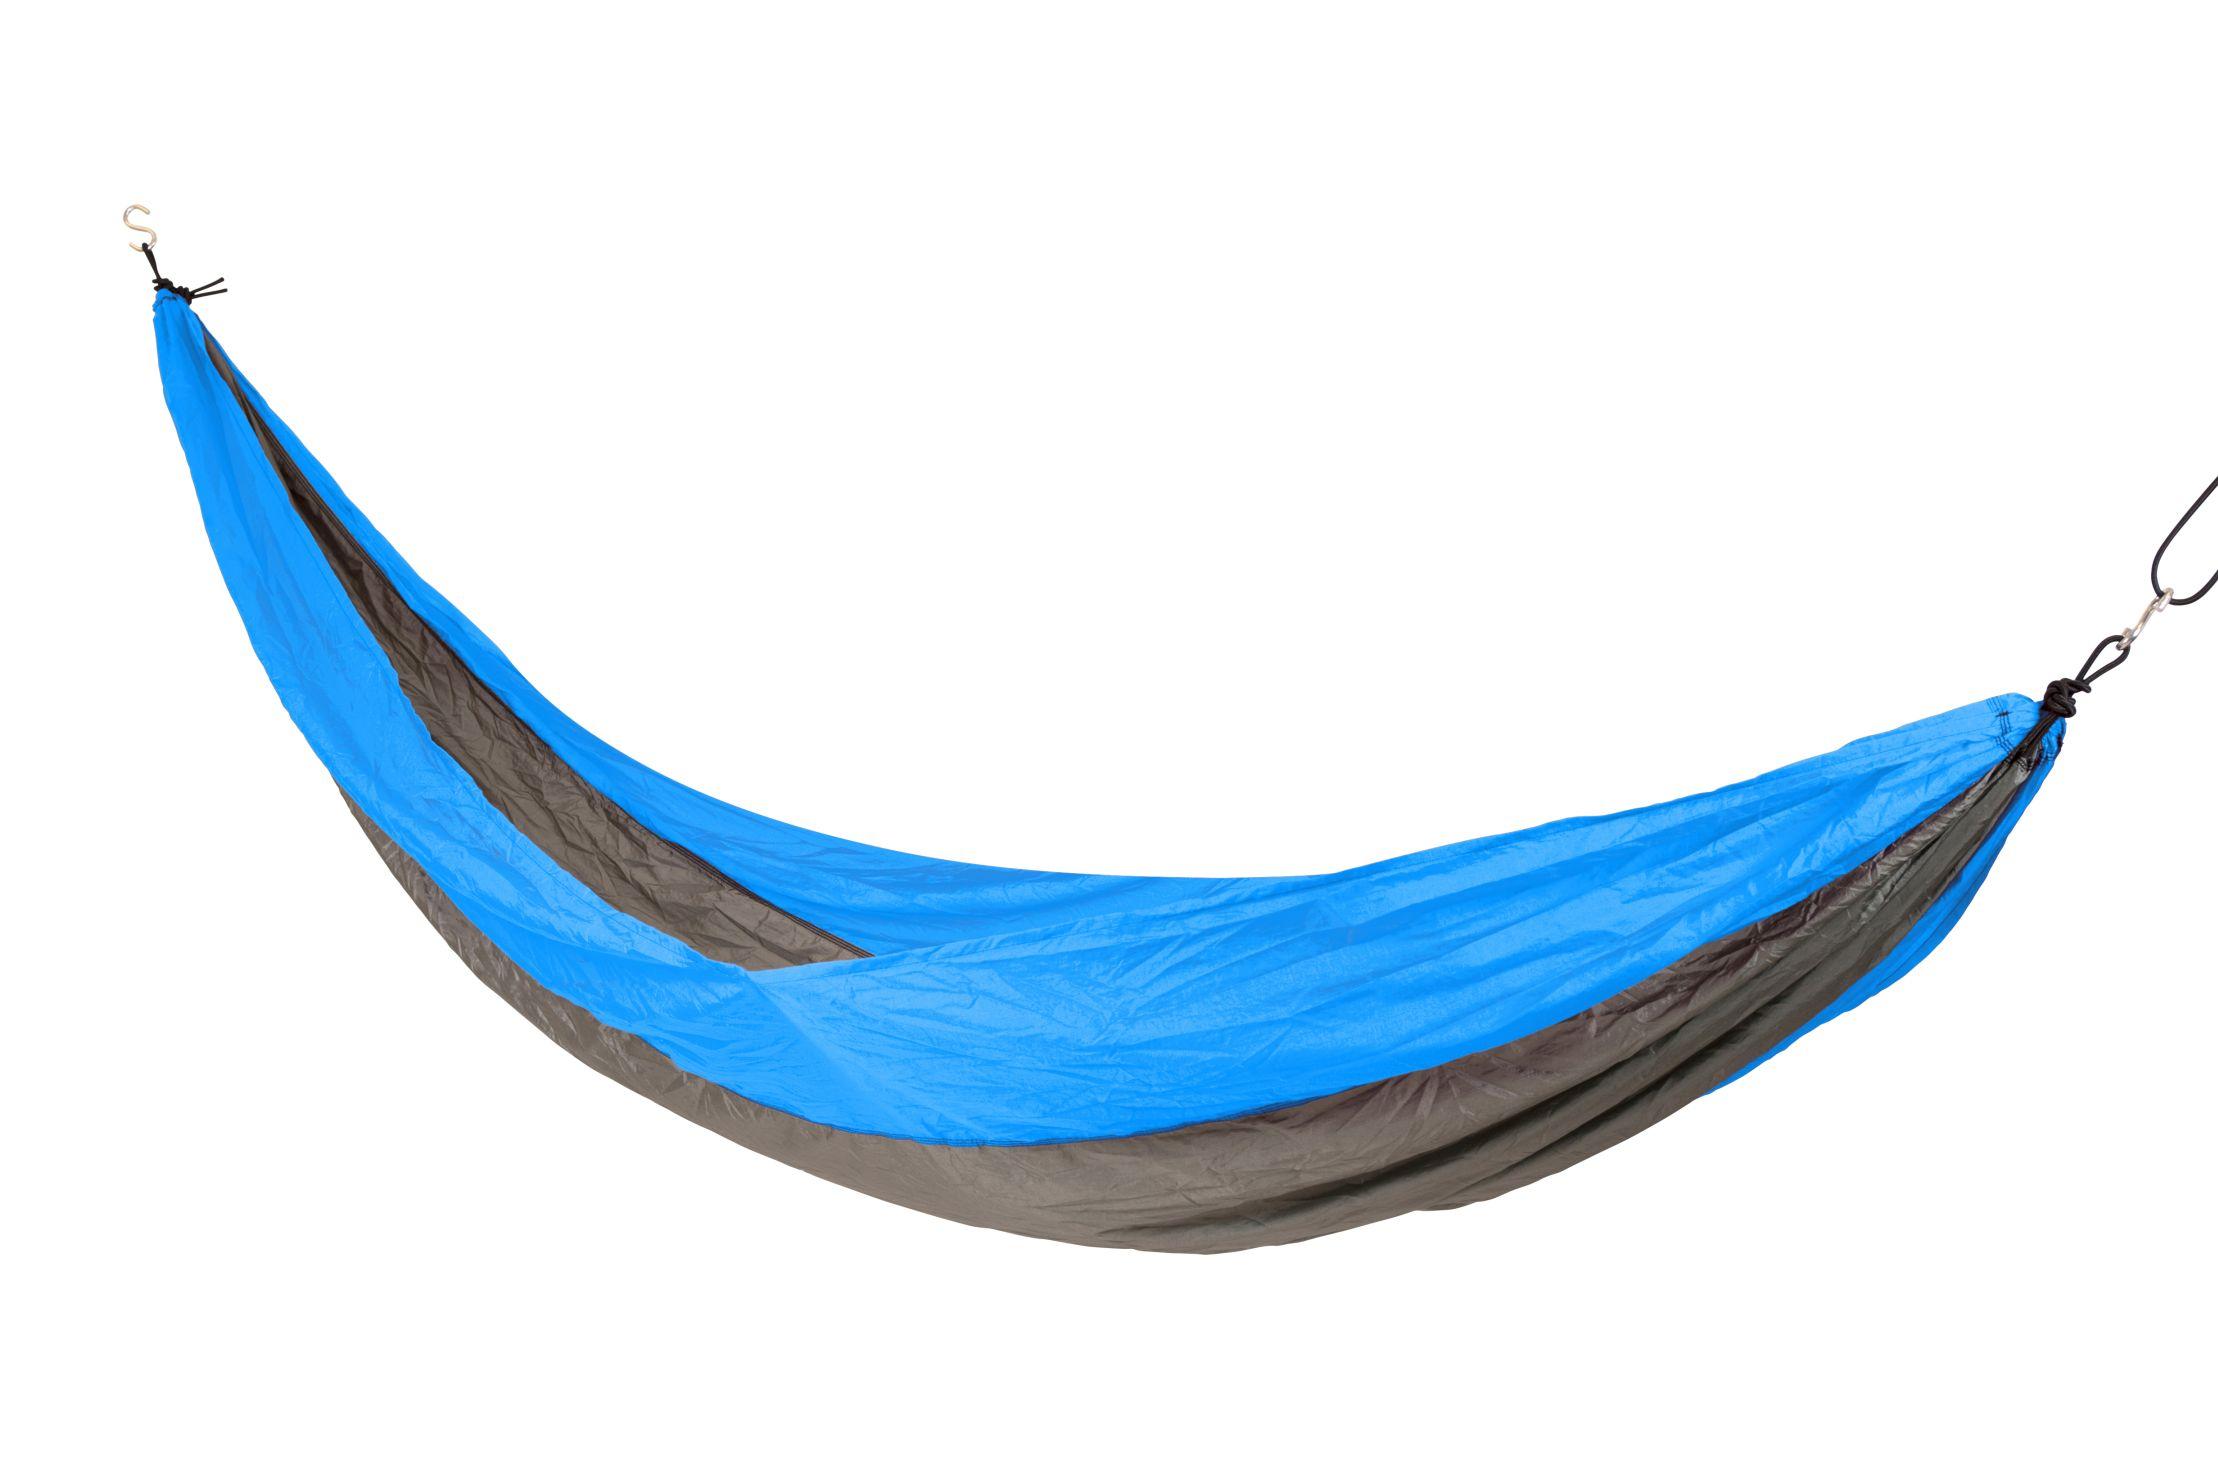 Bo-camp Reishangmat Parachute